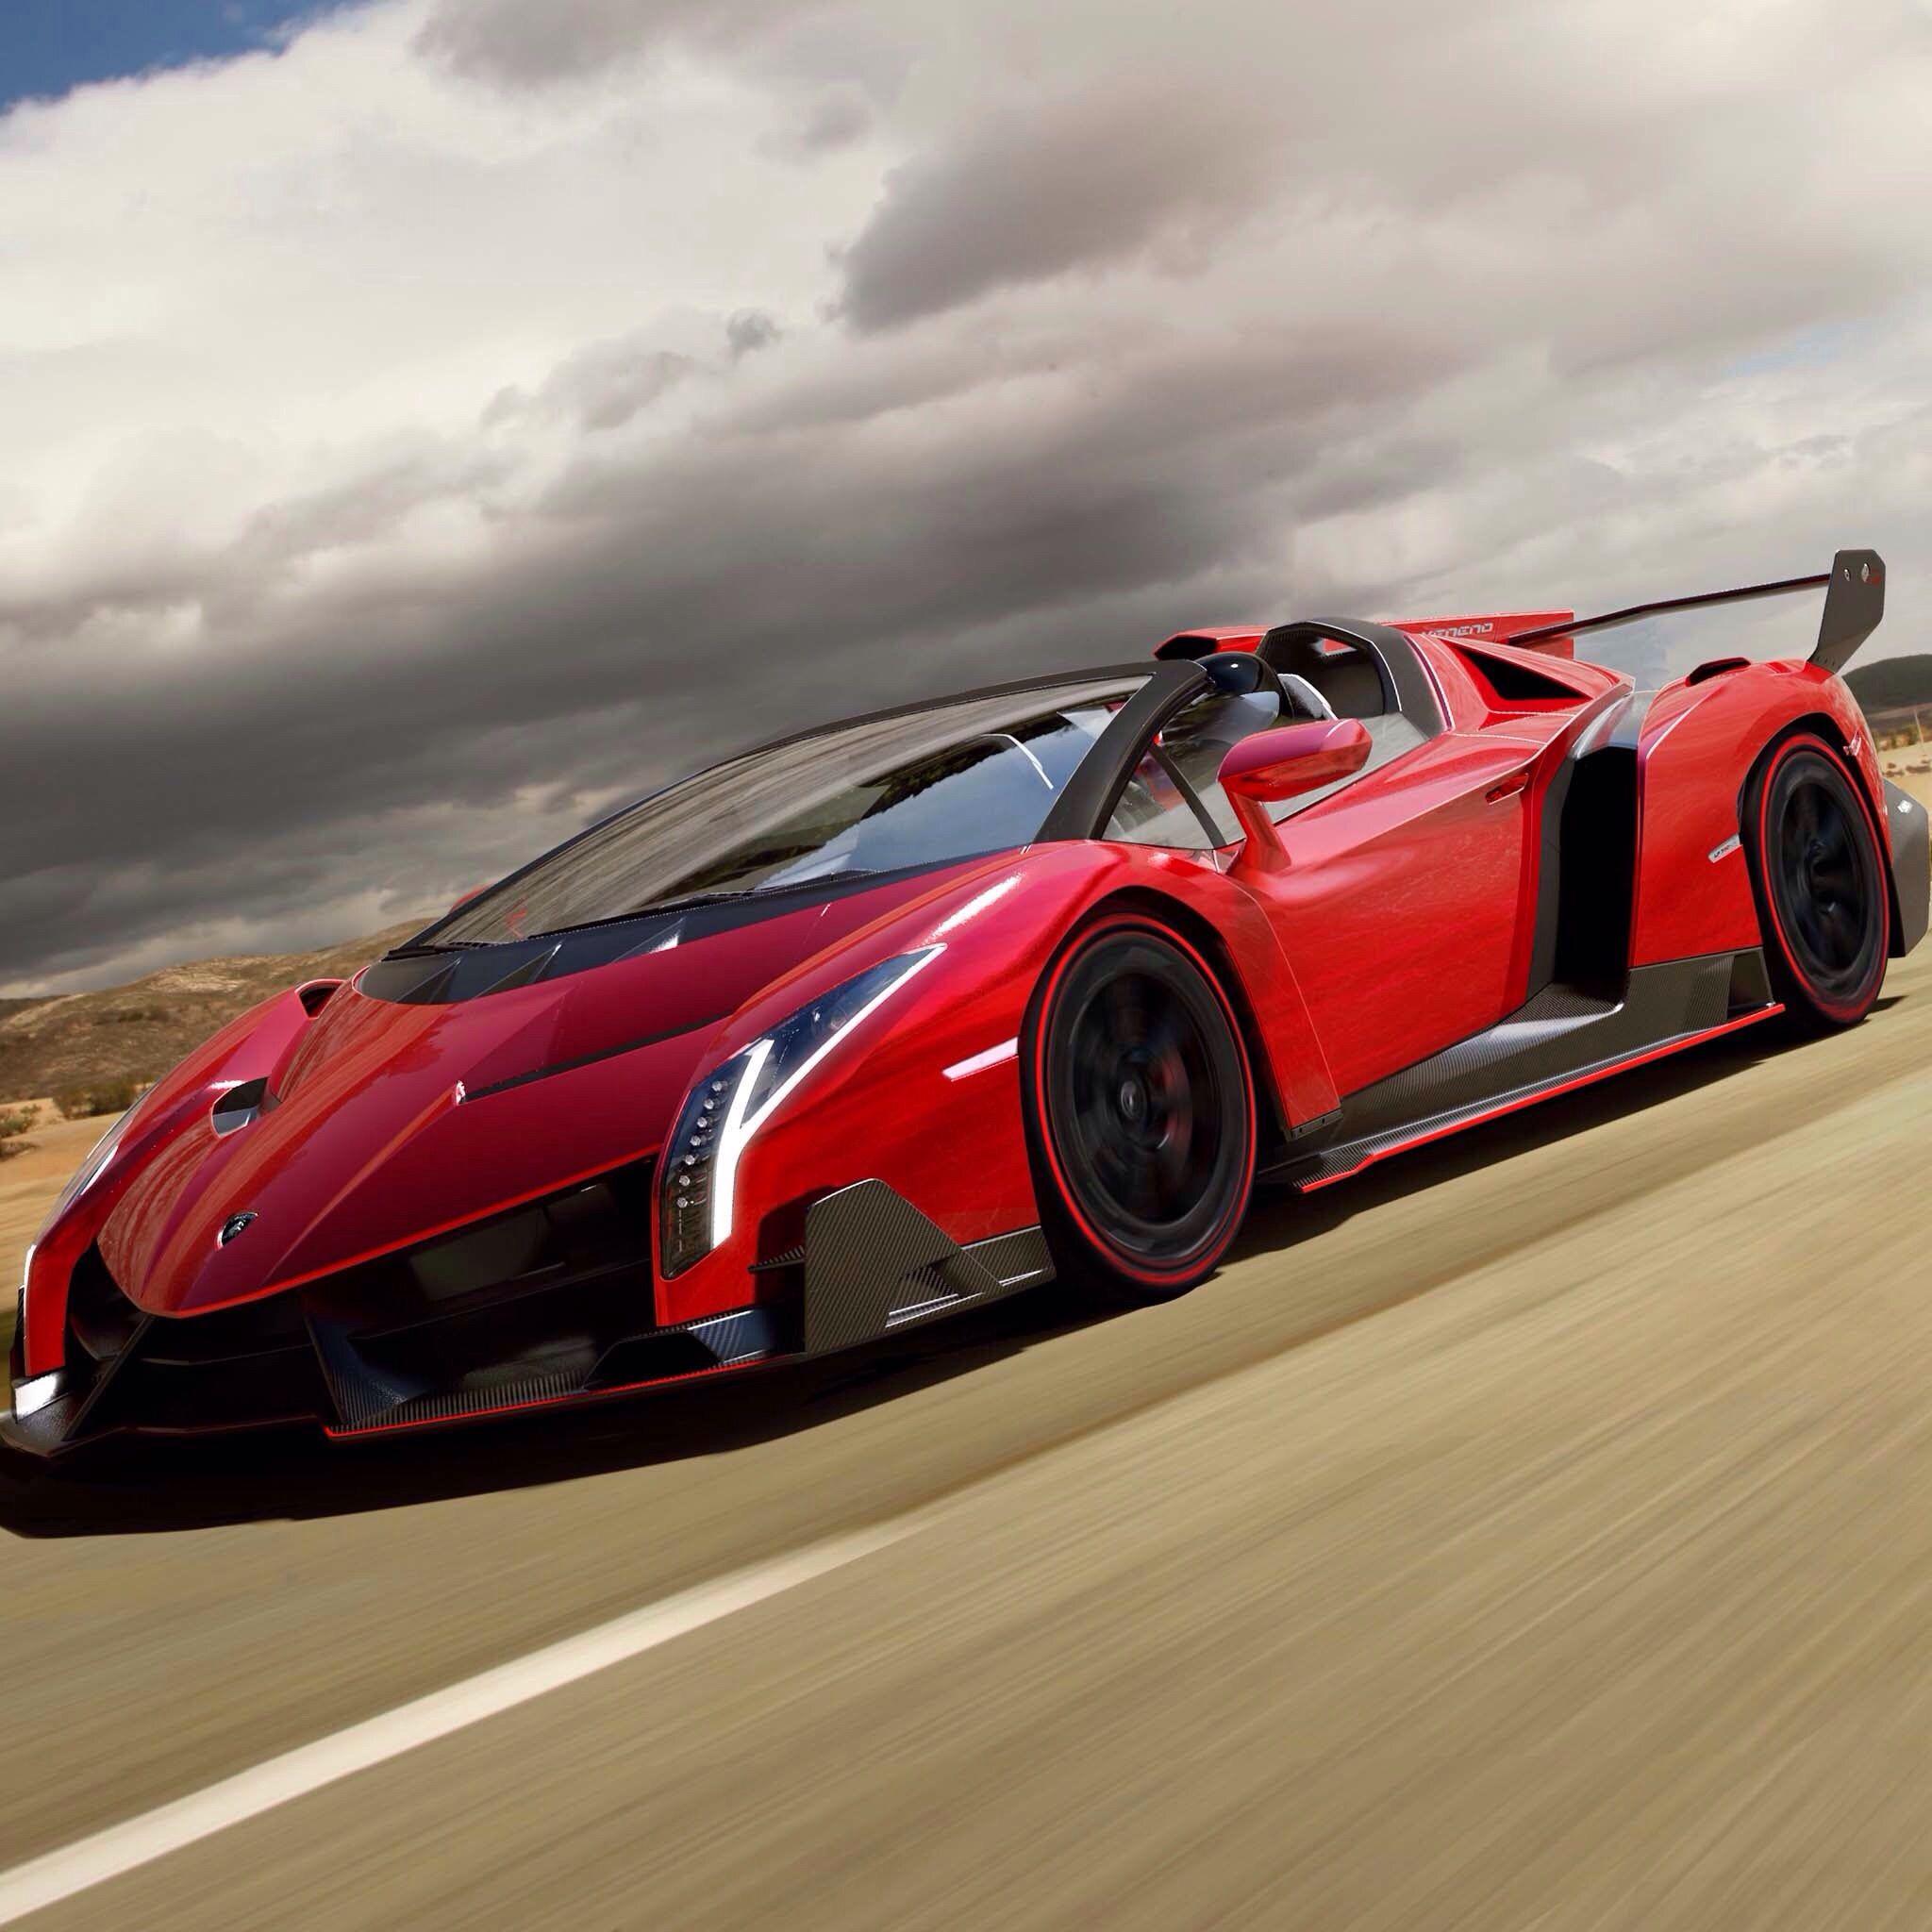 Cherry Red Lamborghini Veneno Sports Cars Luxury Roadsters